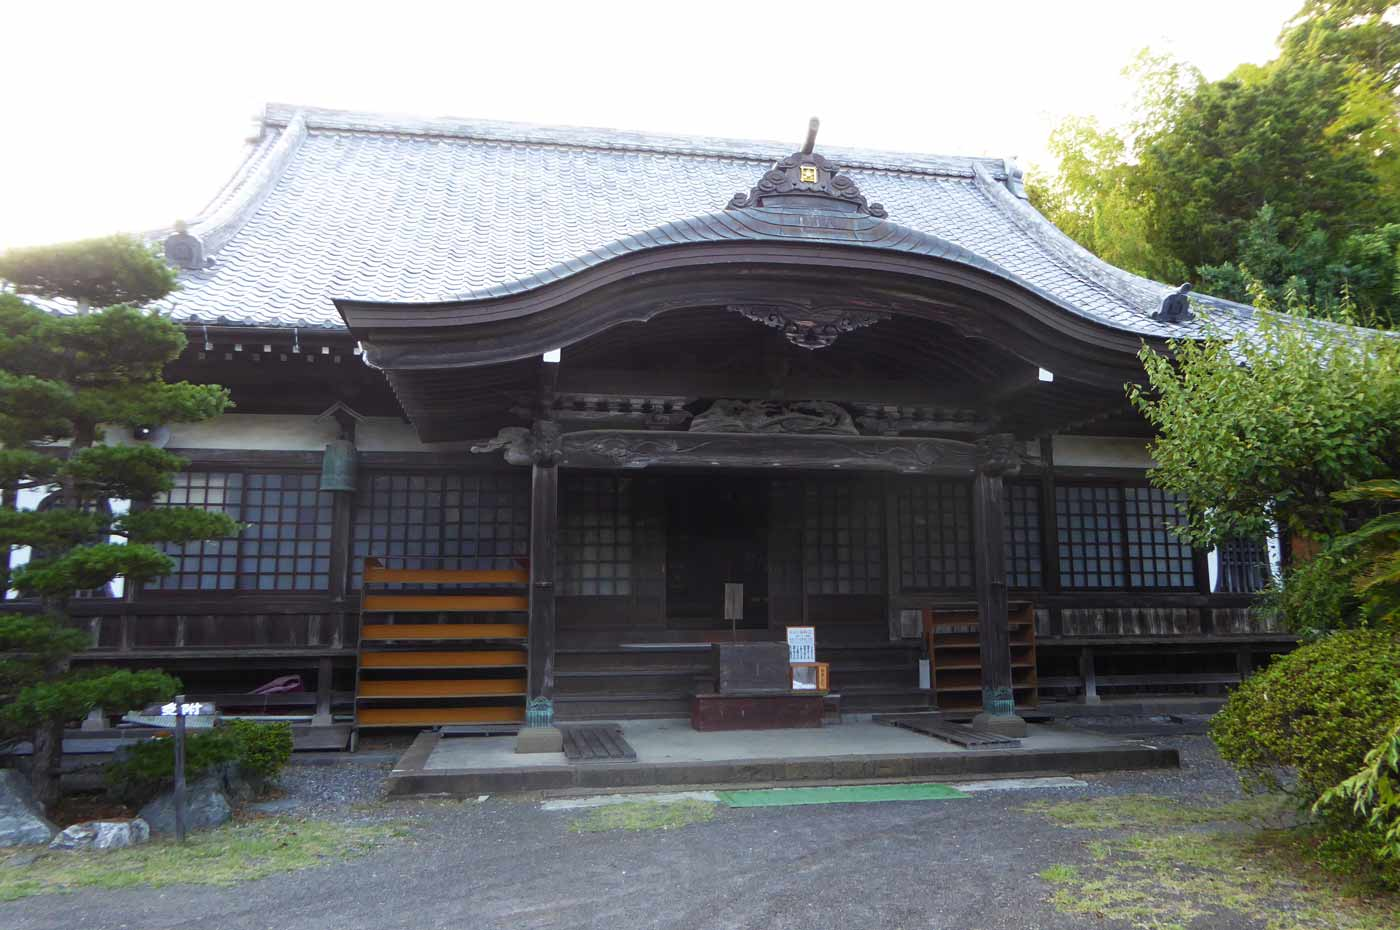 鏡忍寺の仏殿(本堂)